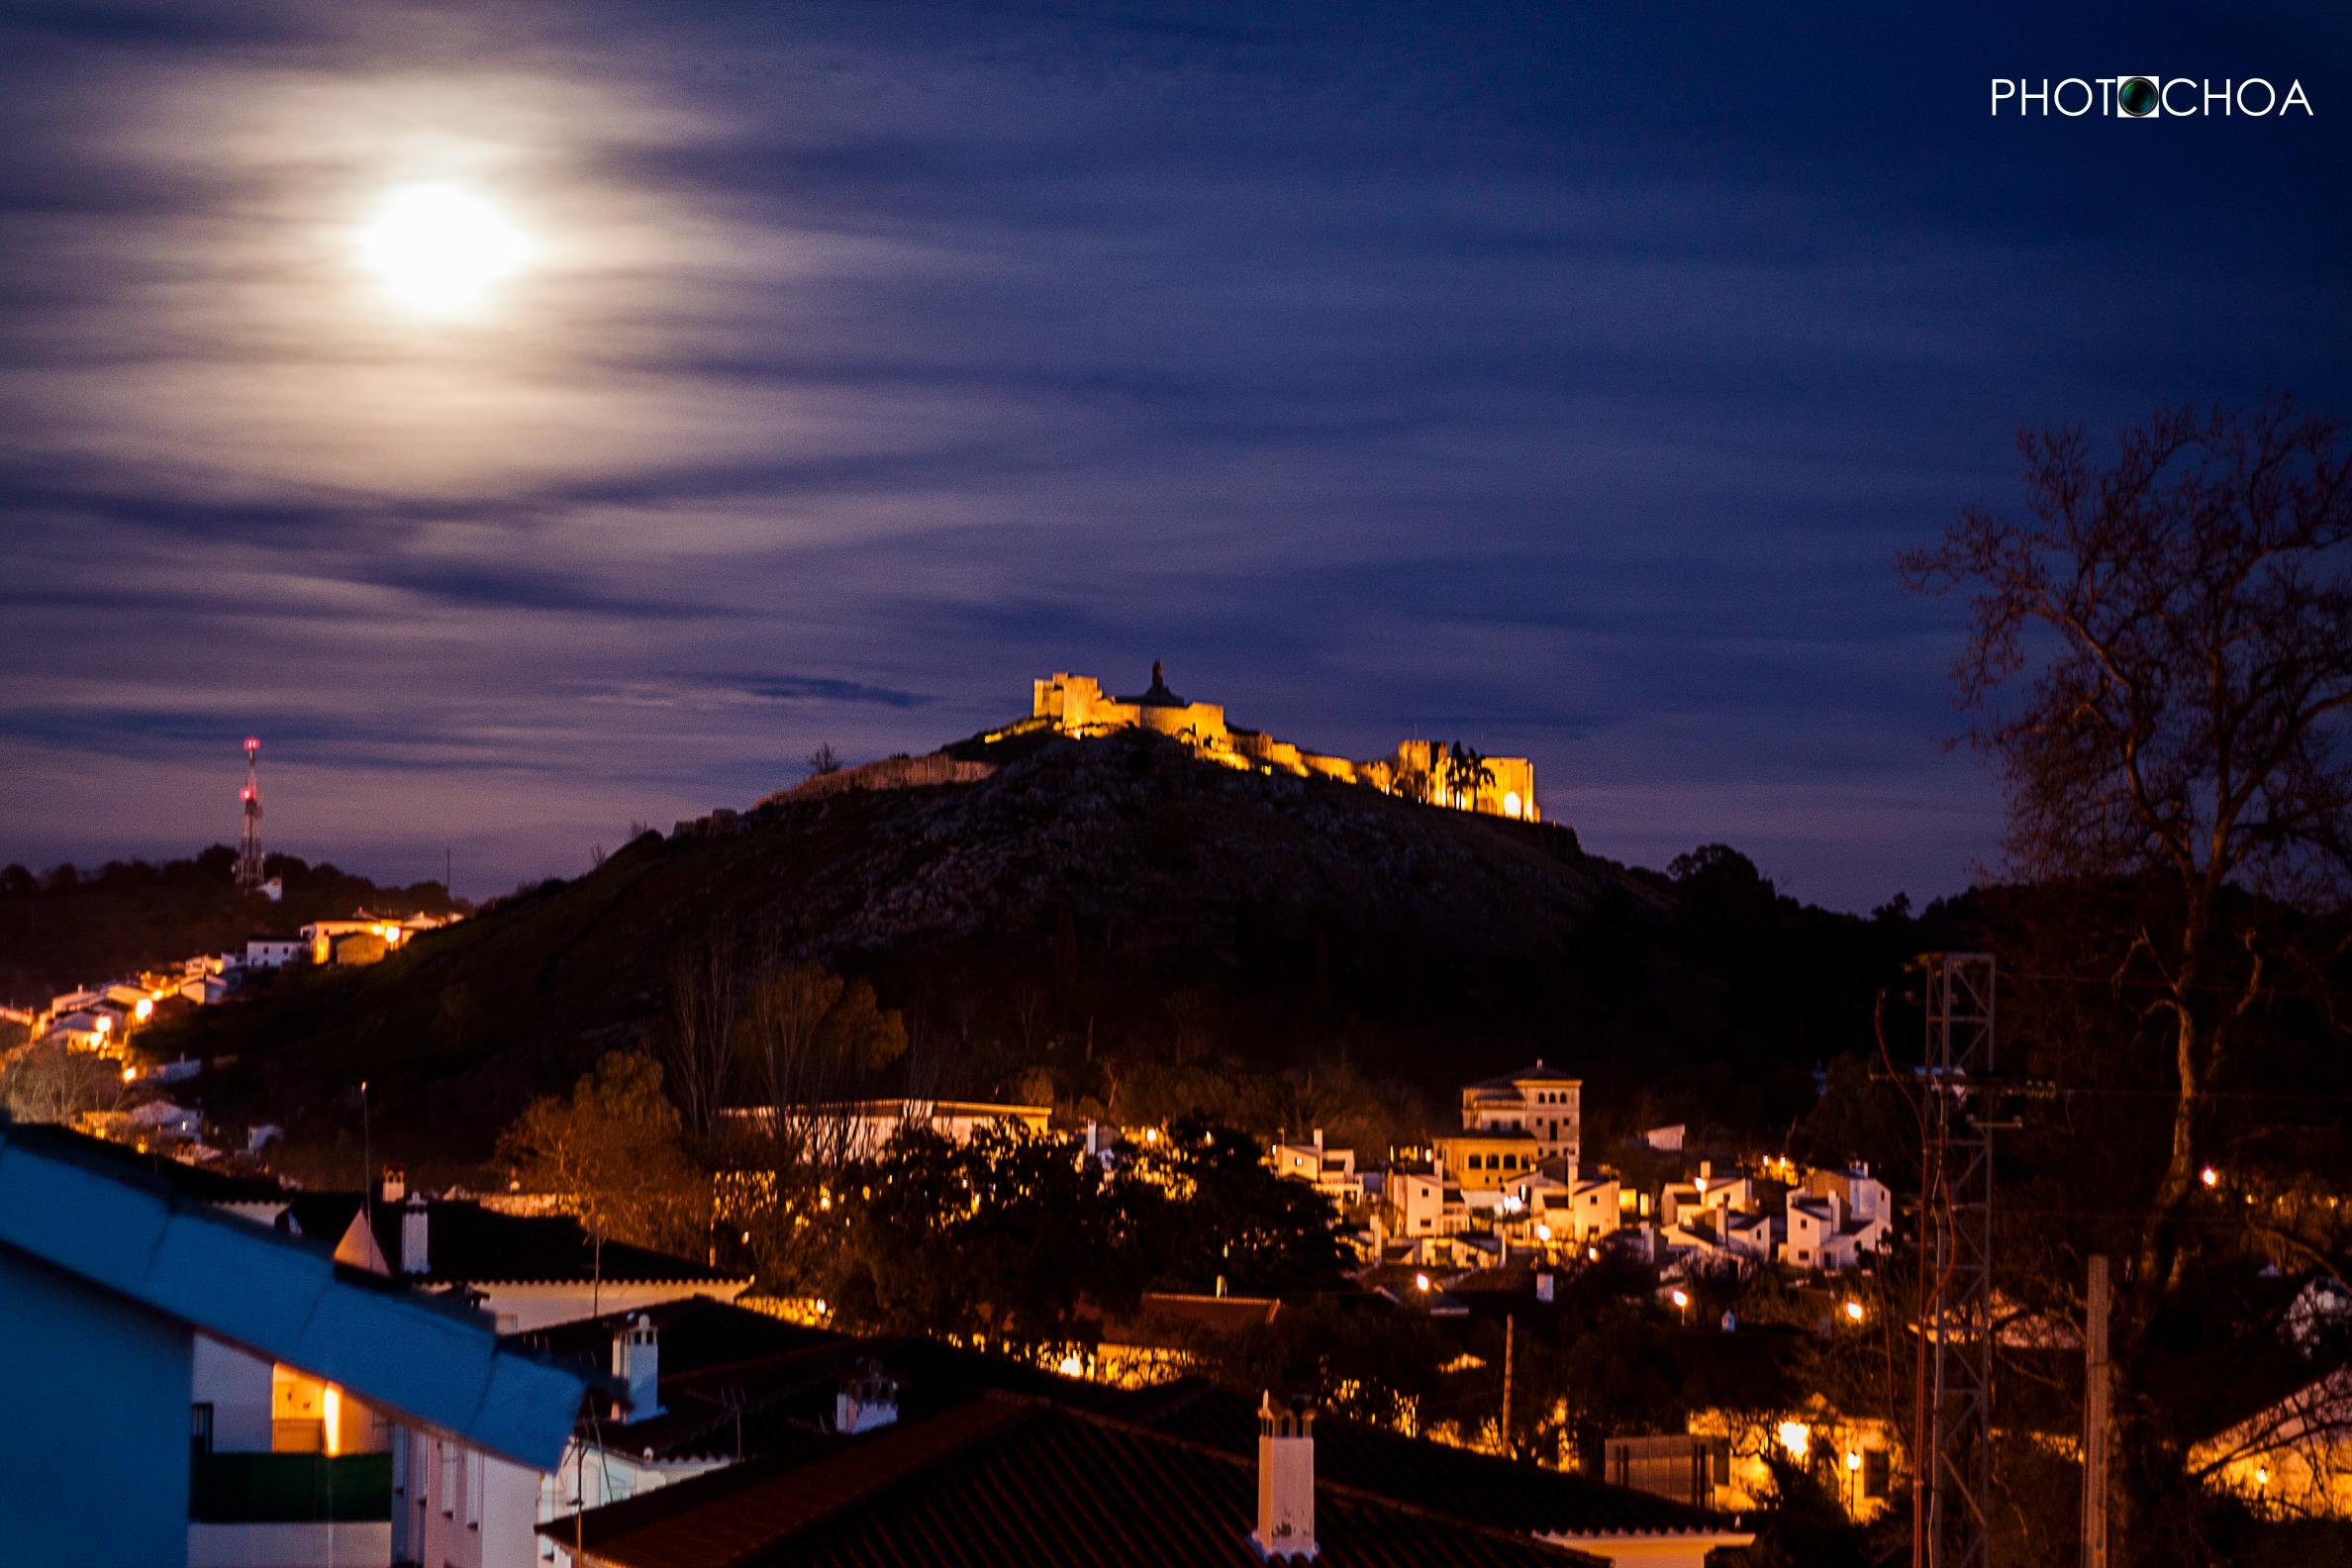 Castillo de Aracena PHOTOCHOA